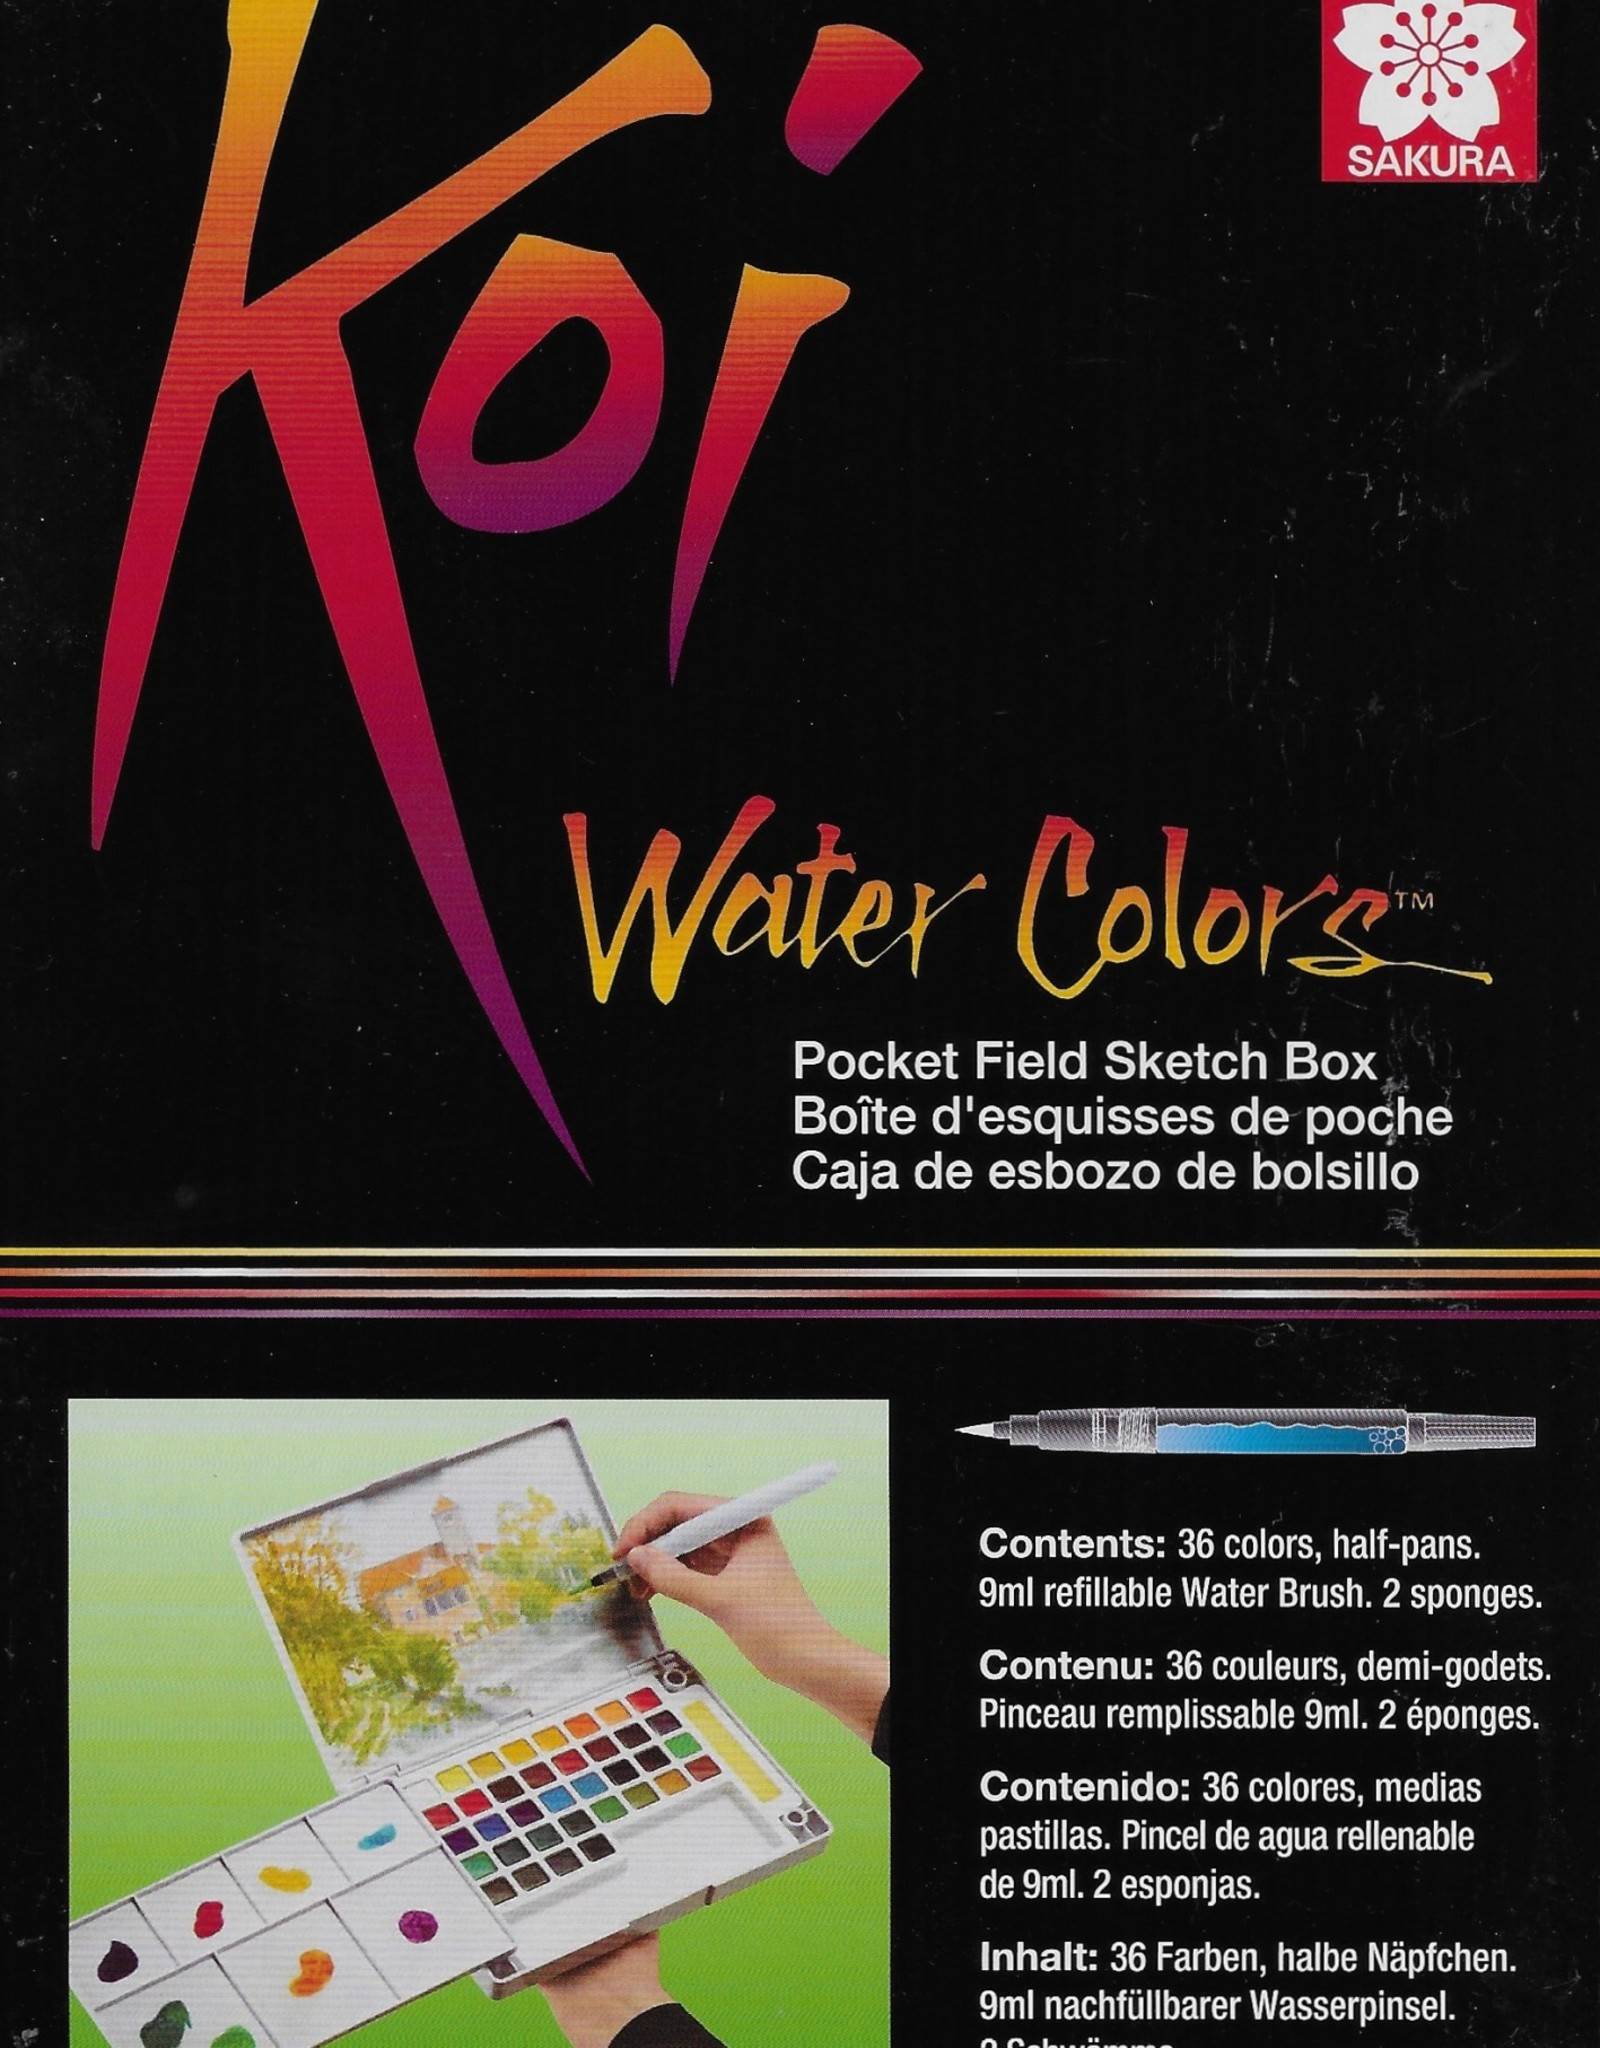 Koi Watercolors Pocket Field Sketch Box Set, 36 Colors